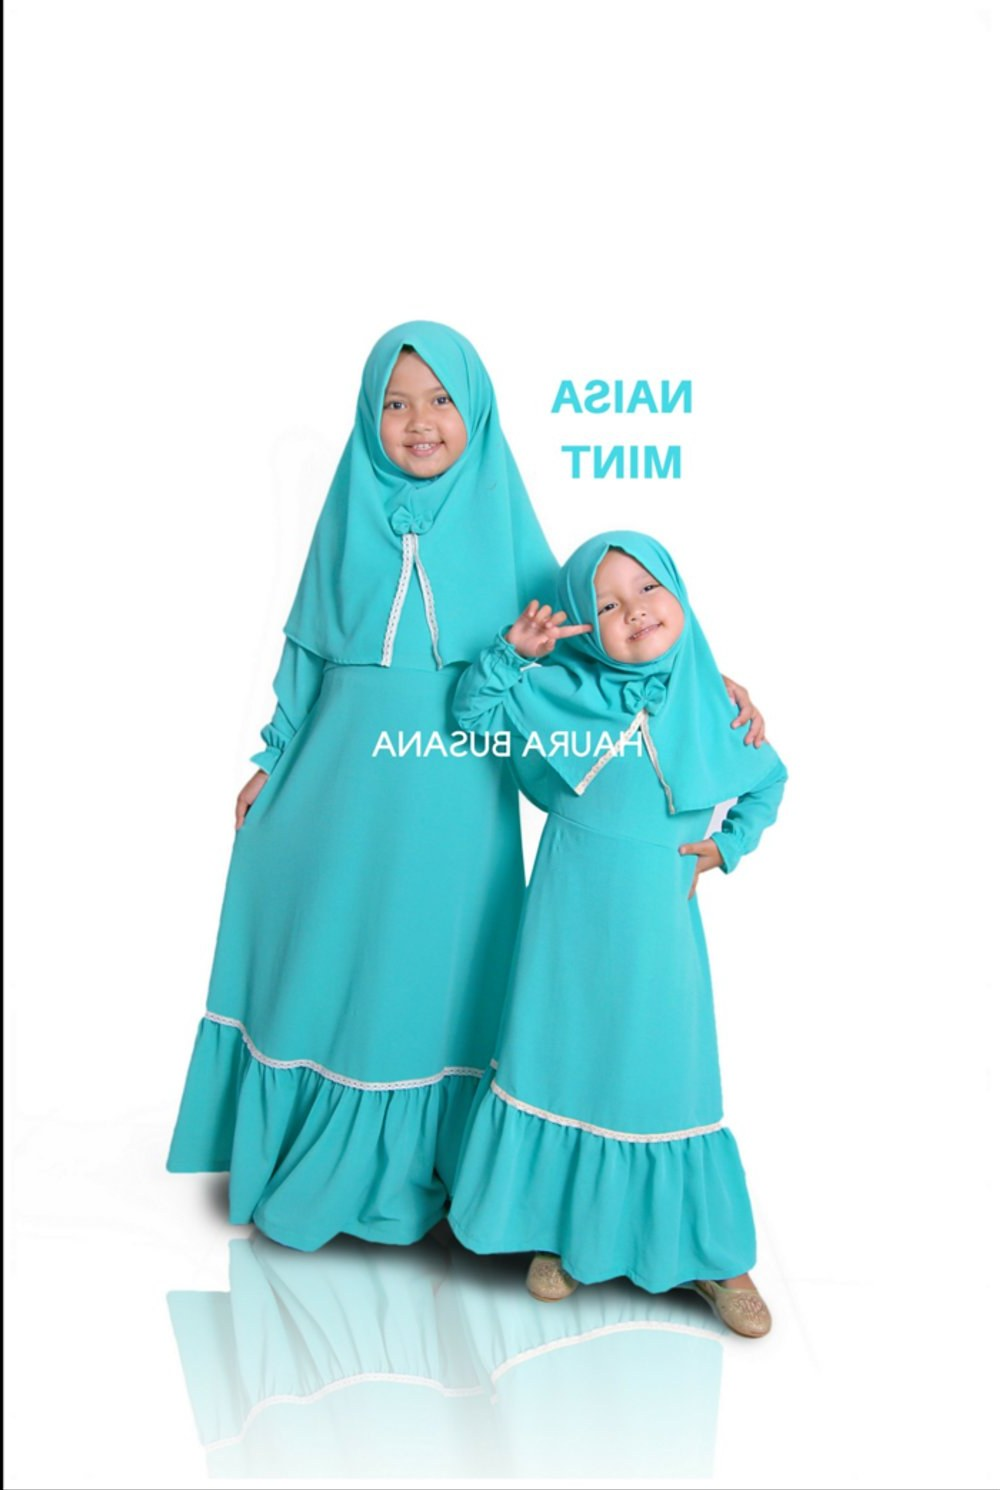 Bentuk Gaun Pengantin Muslimah Biru Muda Etdg Bayi